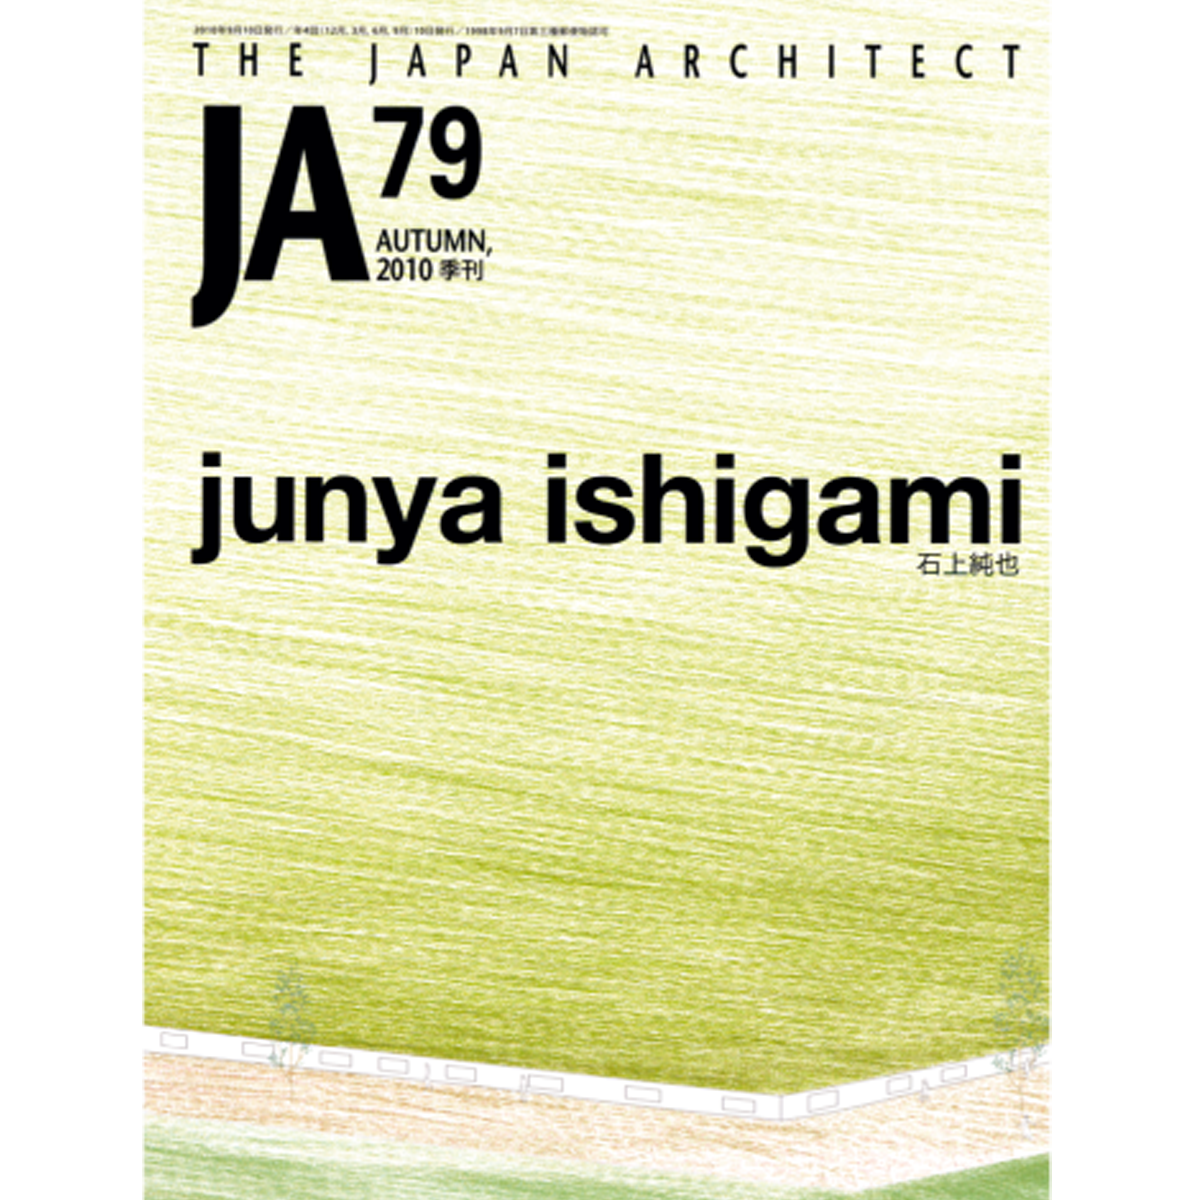 The Japan Architect: Junya Ishigami